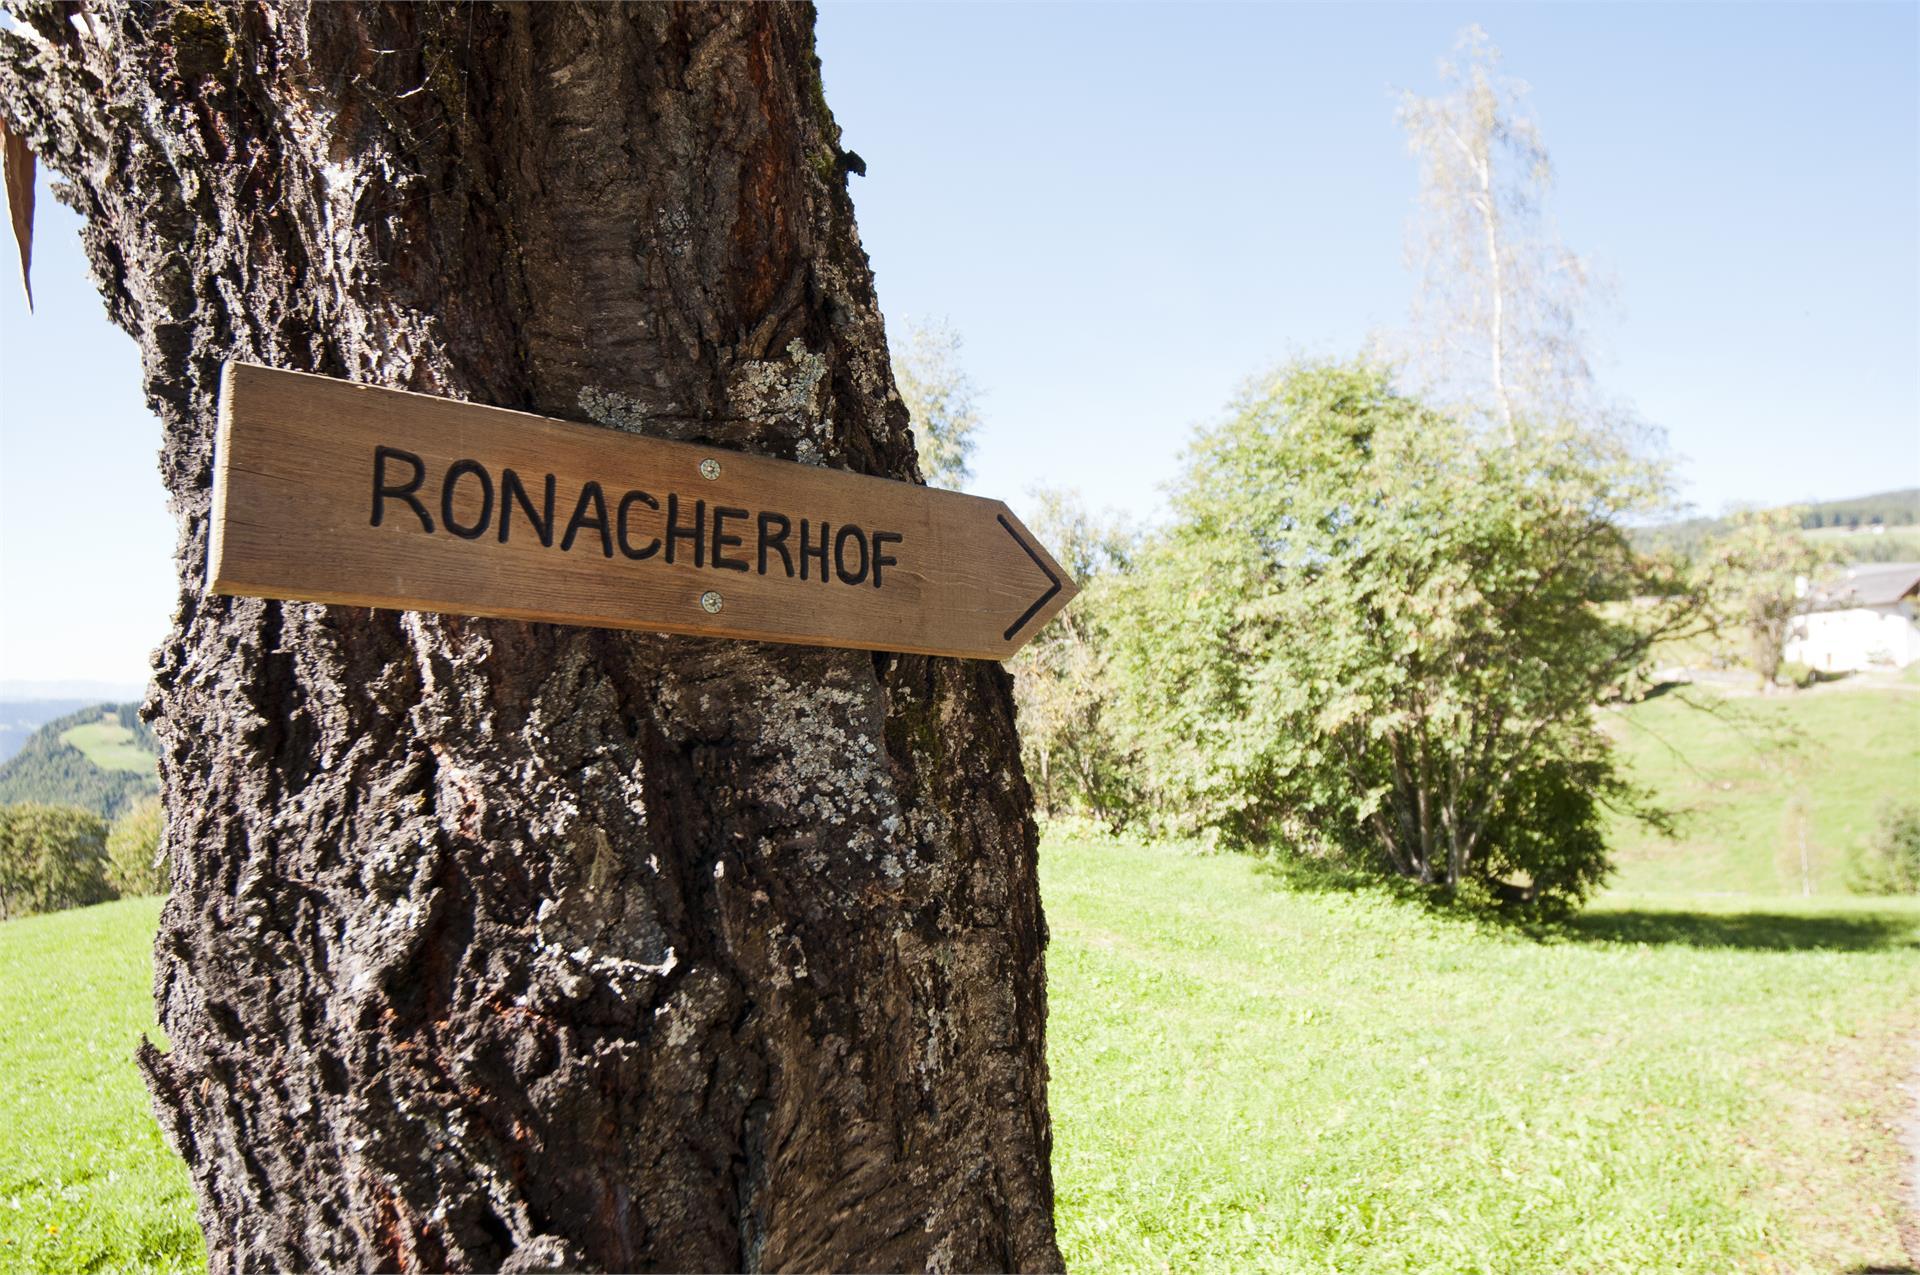 Ronacherhof Collalbo Renon